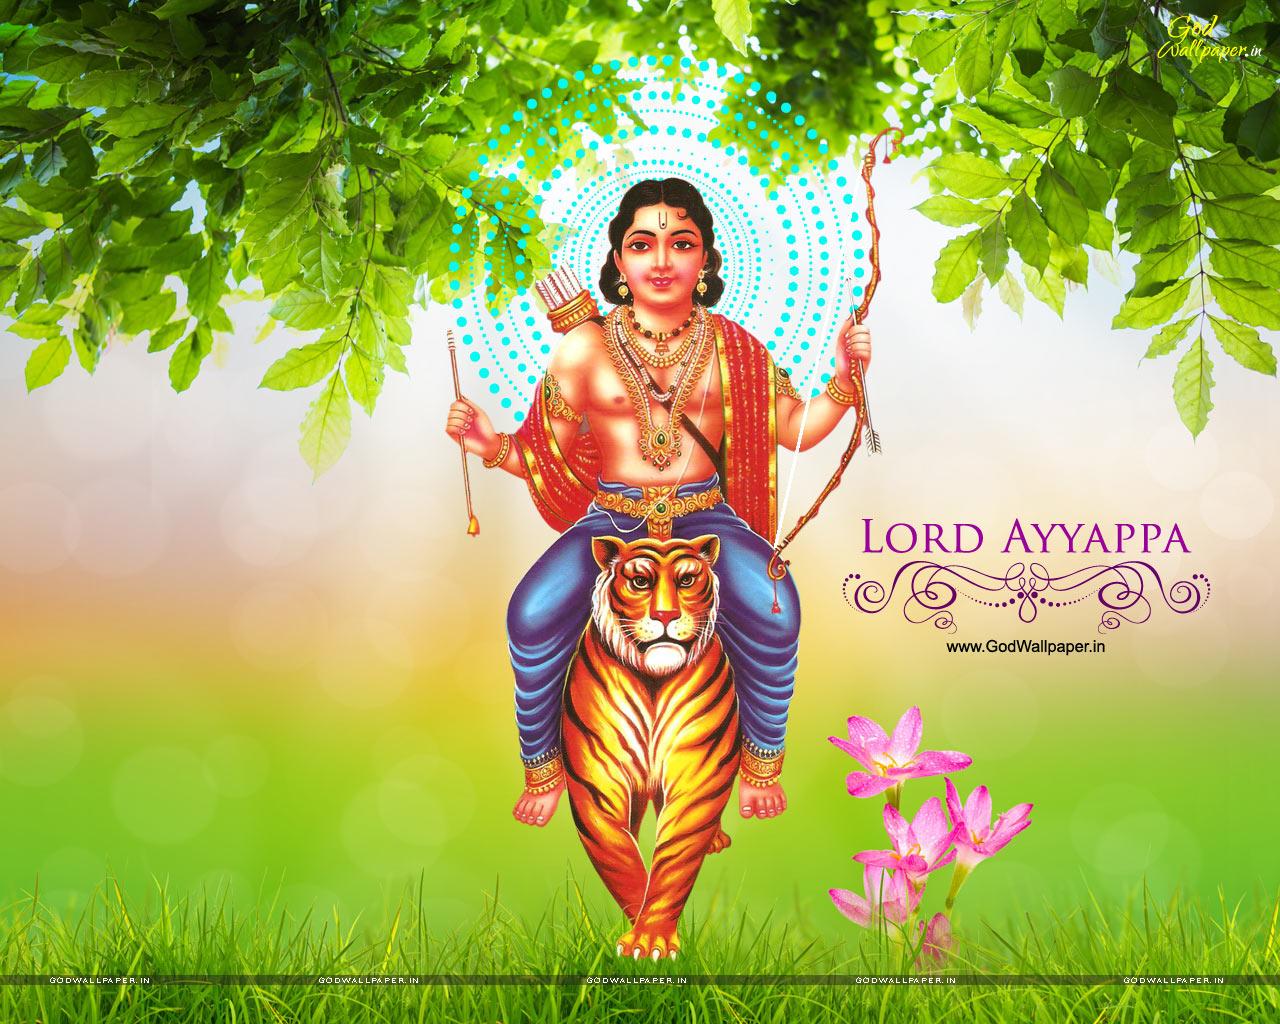 Ayyappa Wallpapers Hd For Desktop